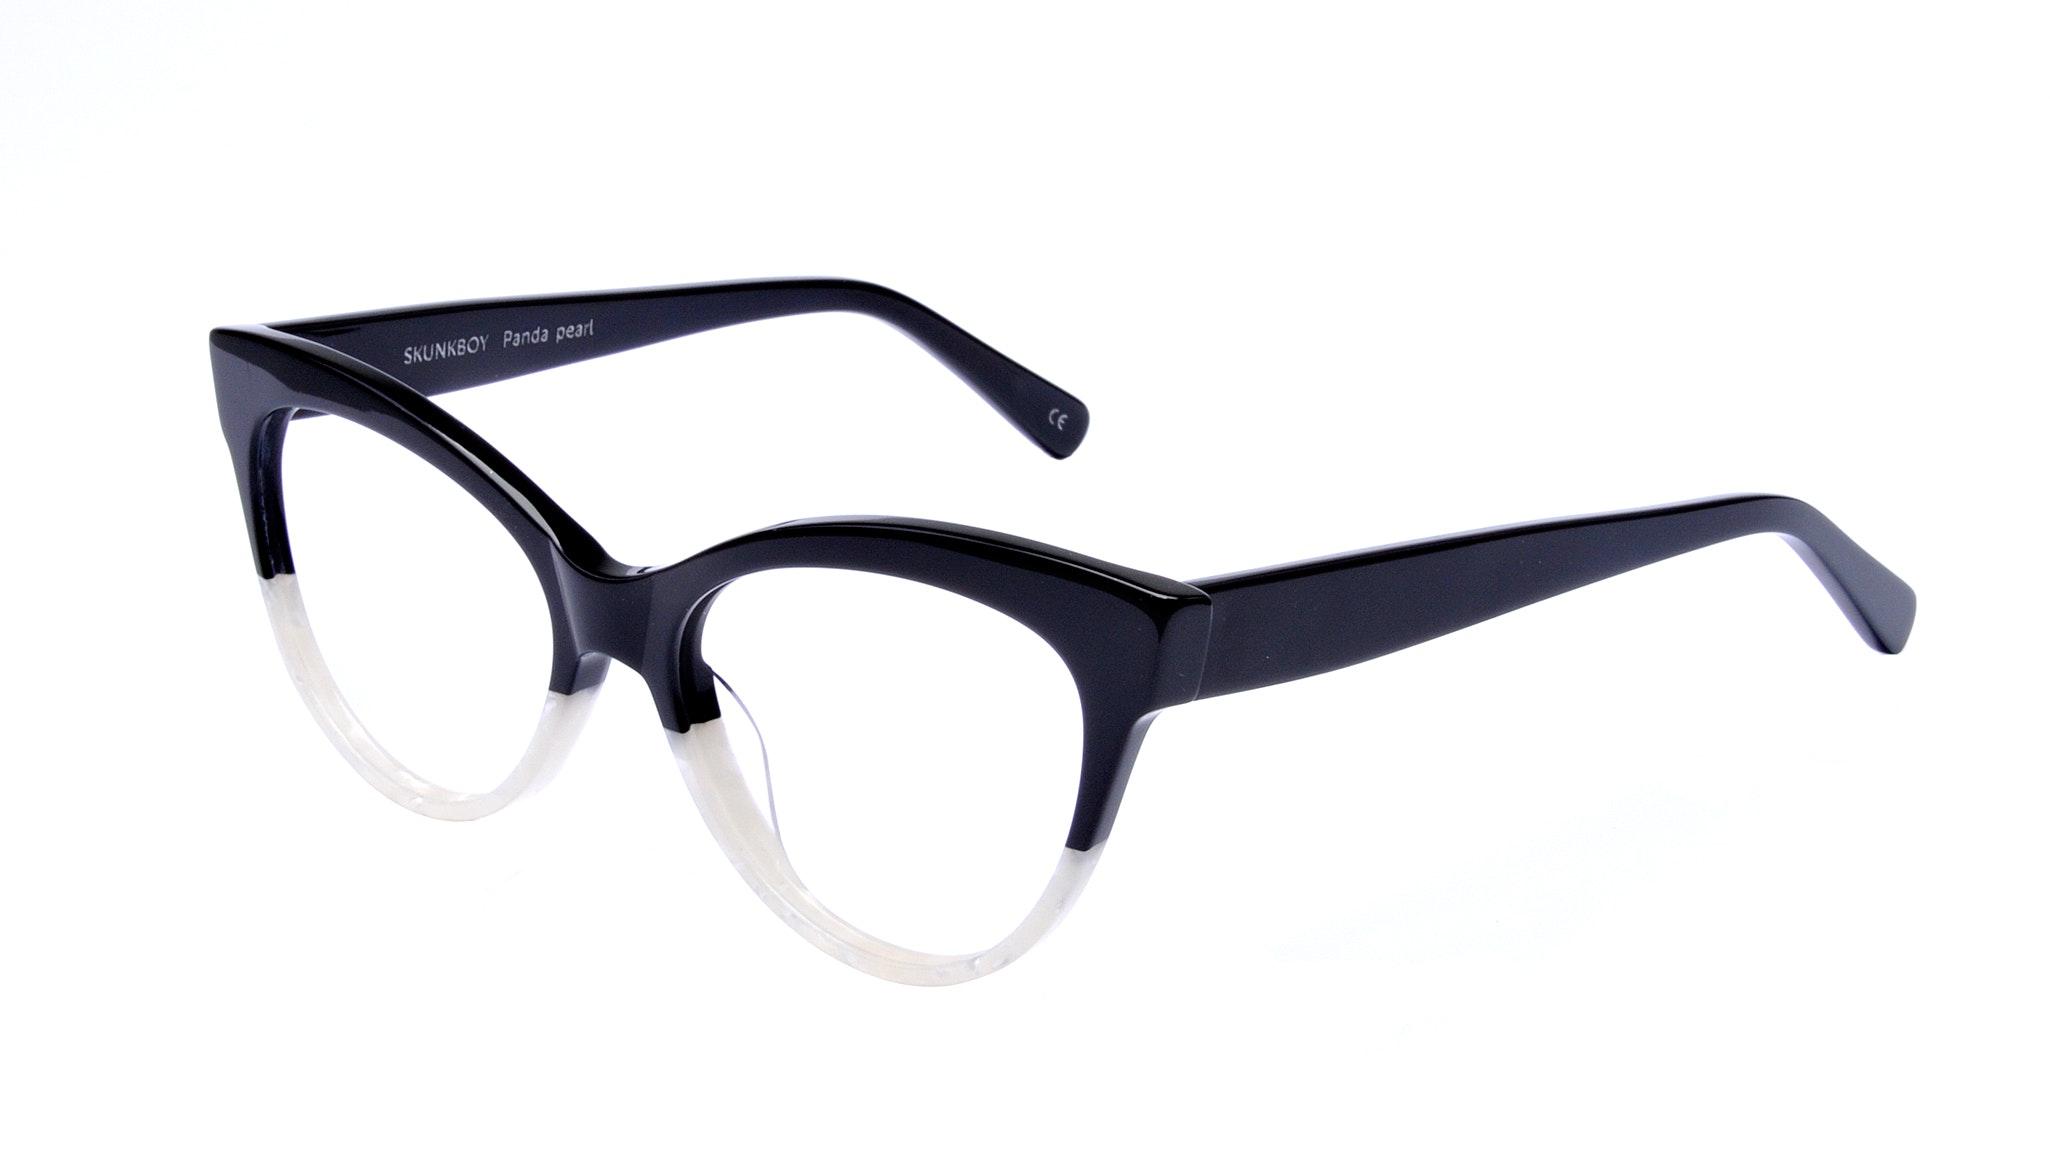 in fashion glasses  Women\u0027s Eyeglasses - SkunkBoy in Panda Pearl